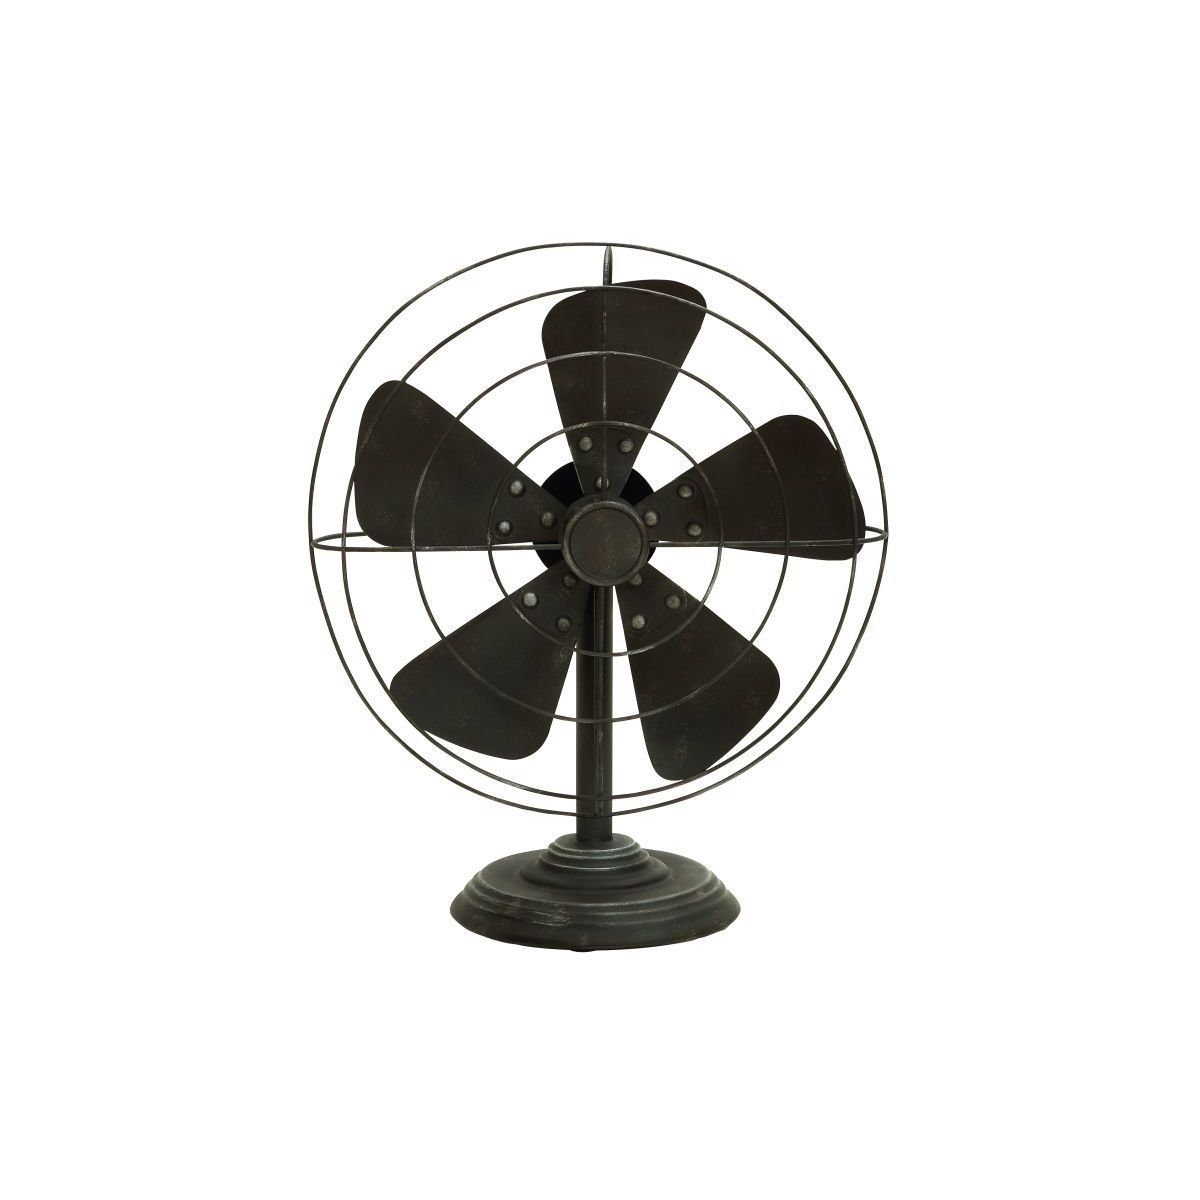 Studio 350 Metal 18-inchH, 15-inchW Non-Functional Fan (M...